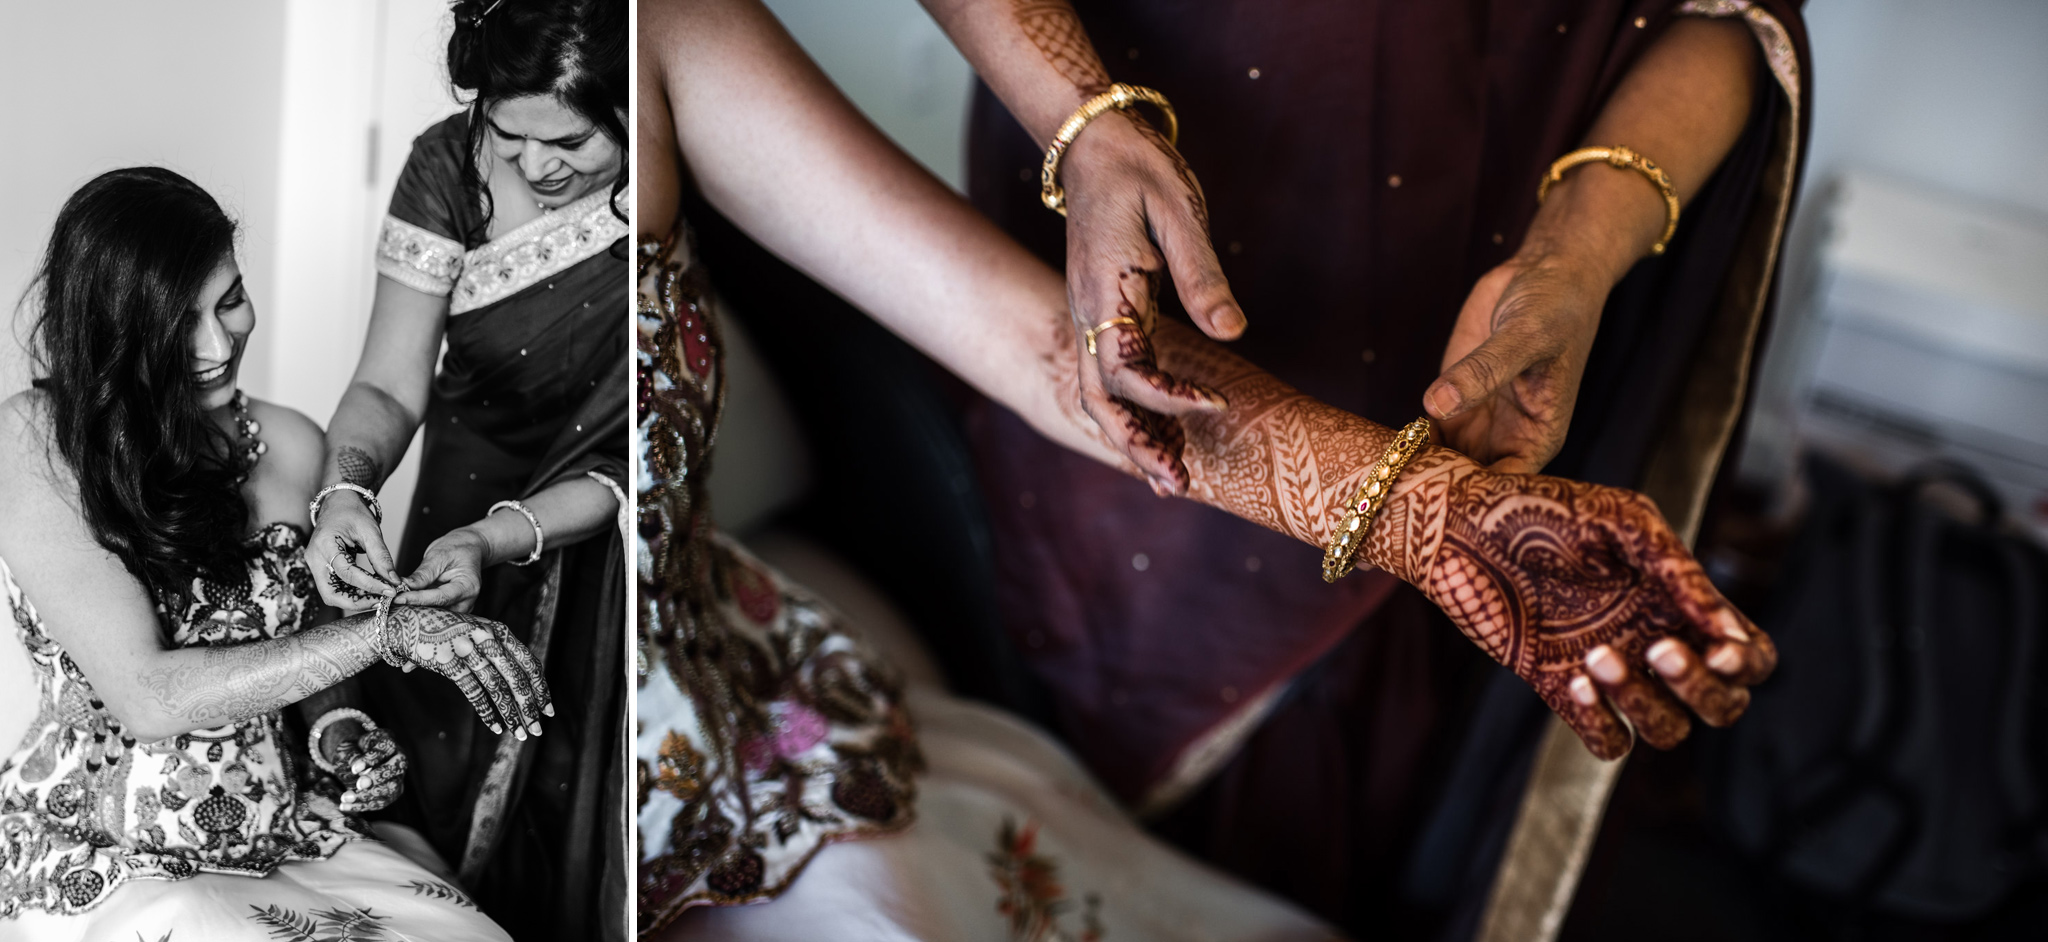 094-bride-mother-getting-ready-hotel-ocho-intimate-wedding-photographer.jpg